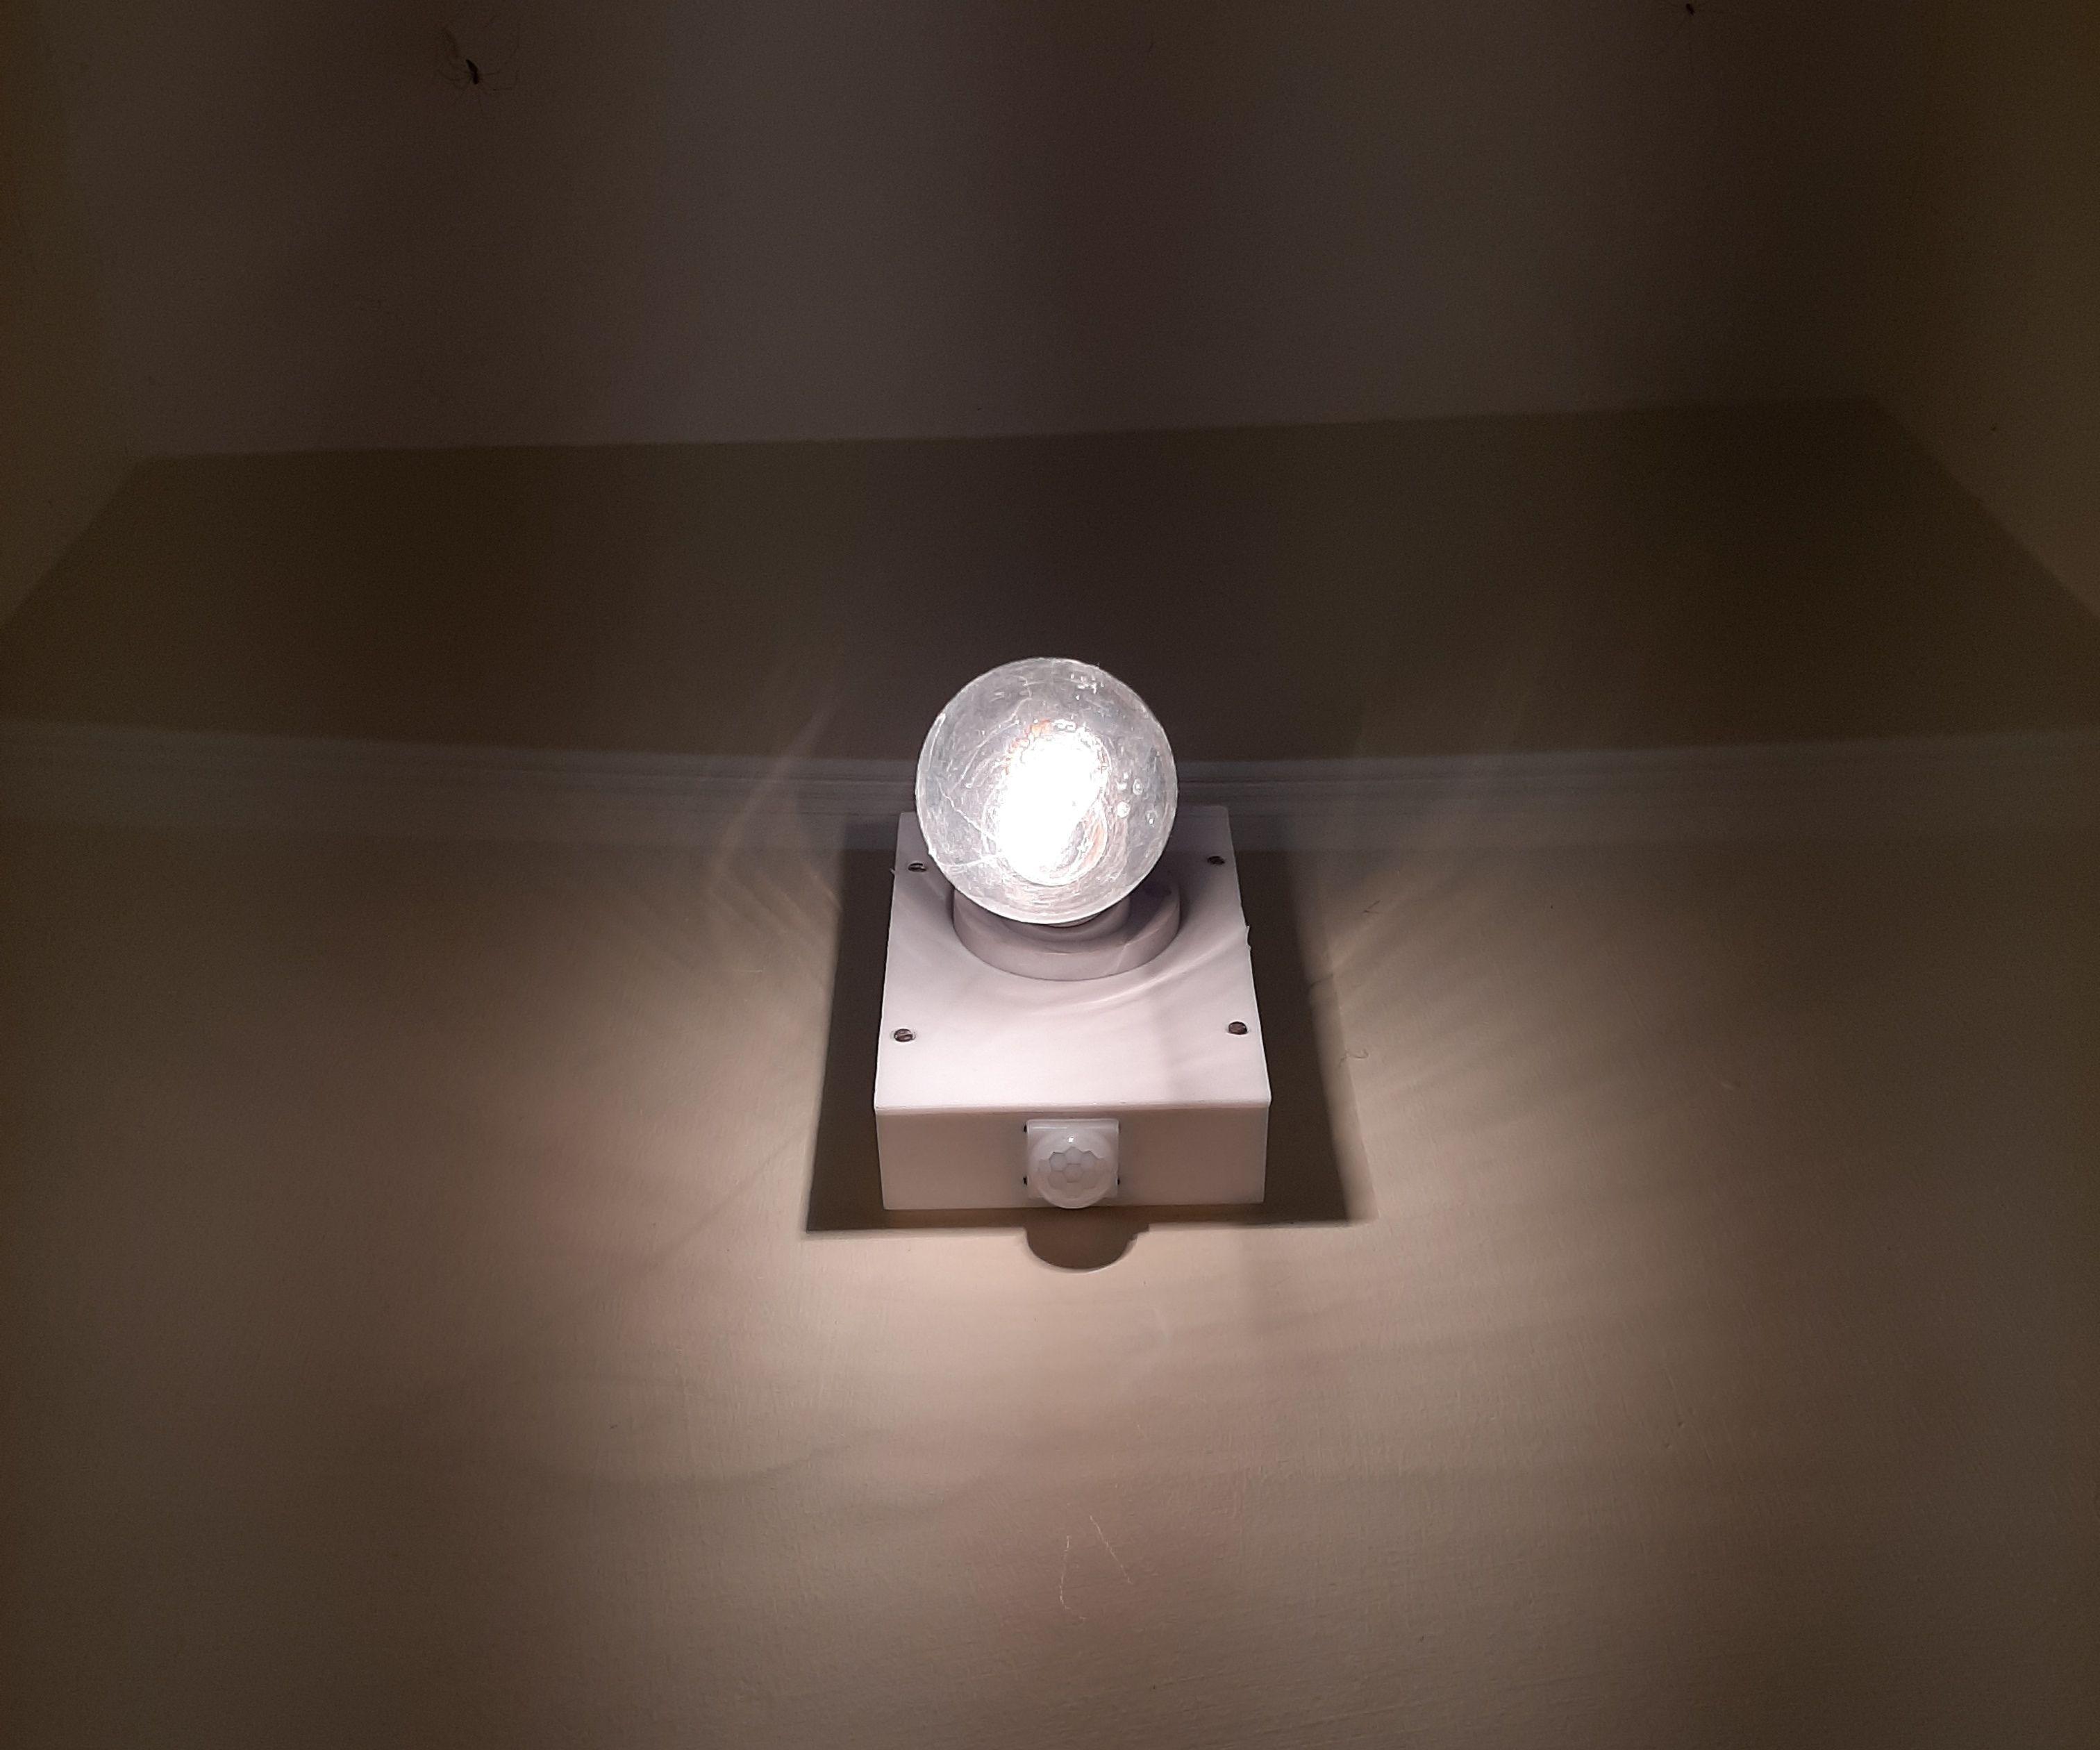 Automatic Bulb Using PIR Sensor